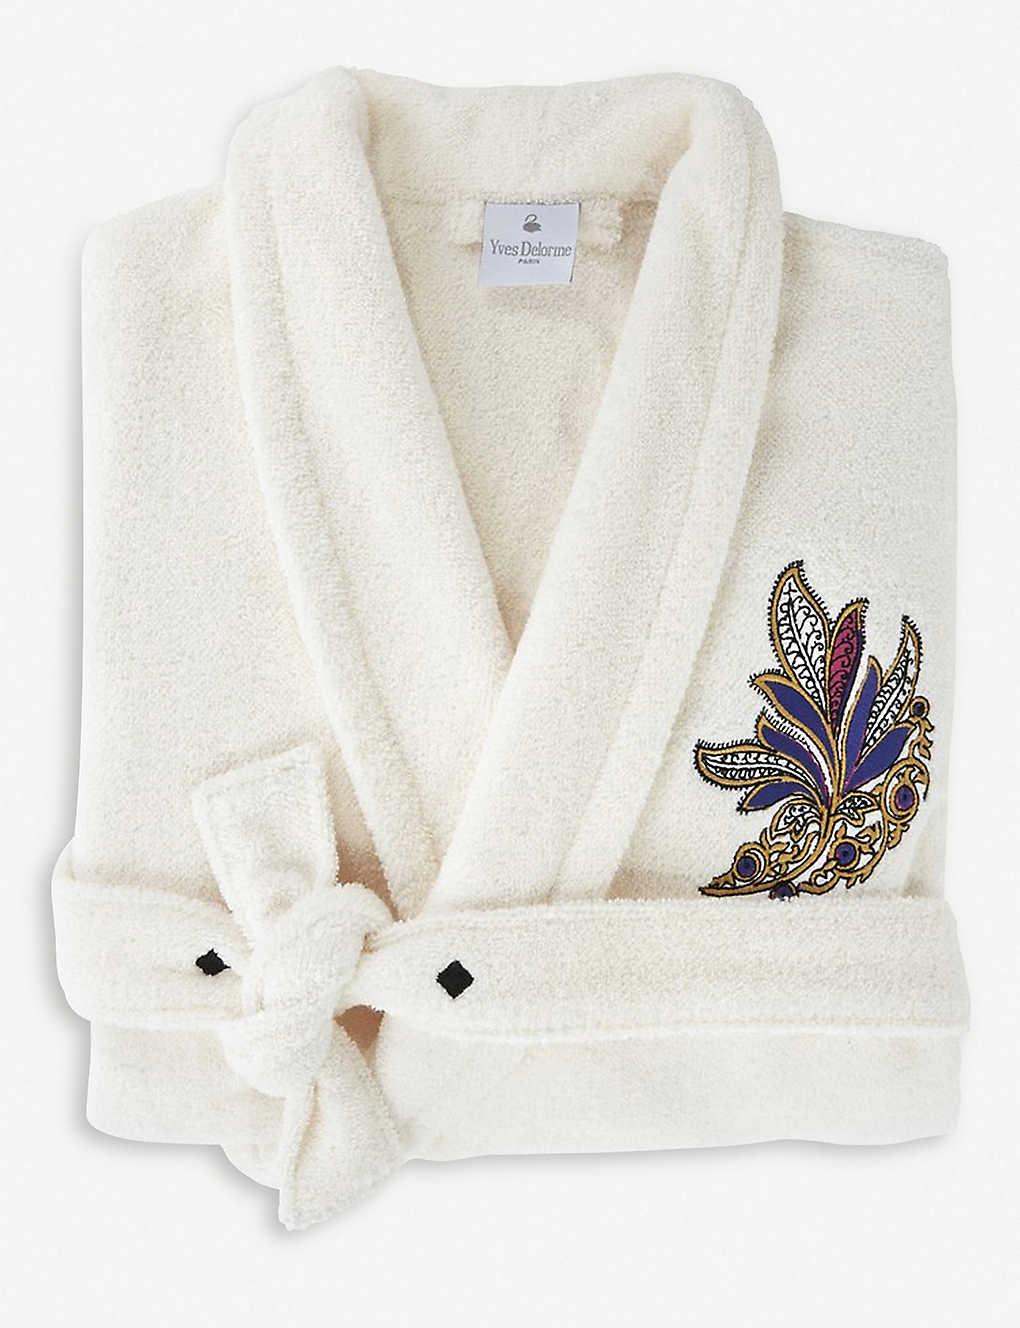 YVES DELORME - Parure cotton bath robe  08fdaccde